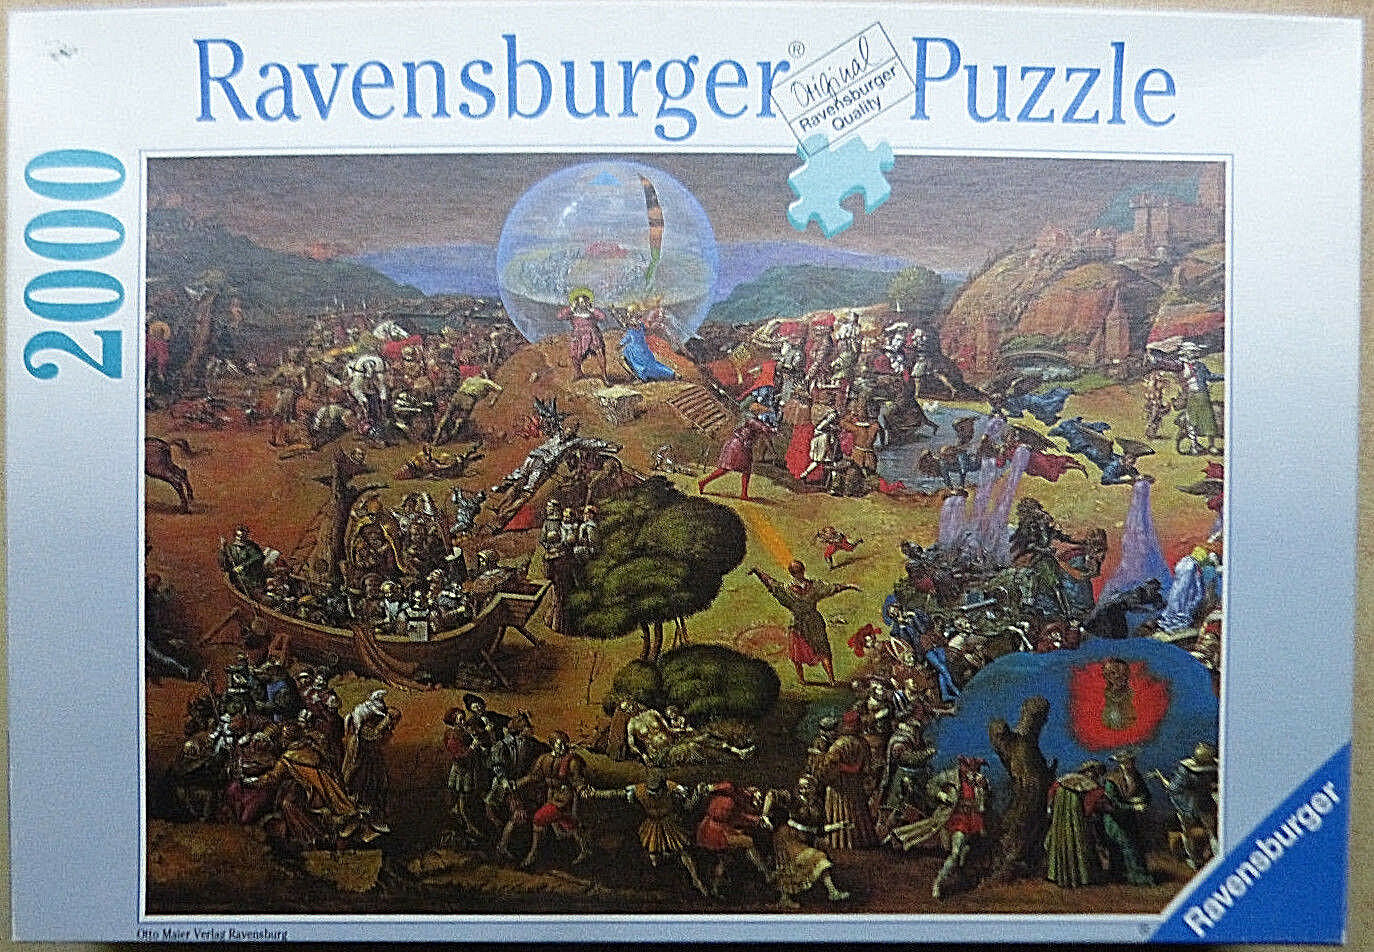 13030. Puzzle Panorama Panorama Panorama Frankenhausen 2000 Teile Ravensburger 93fa5f